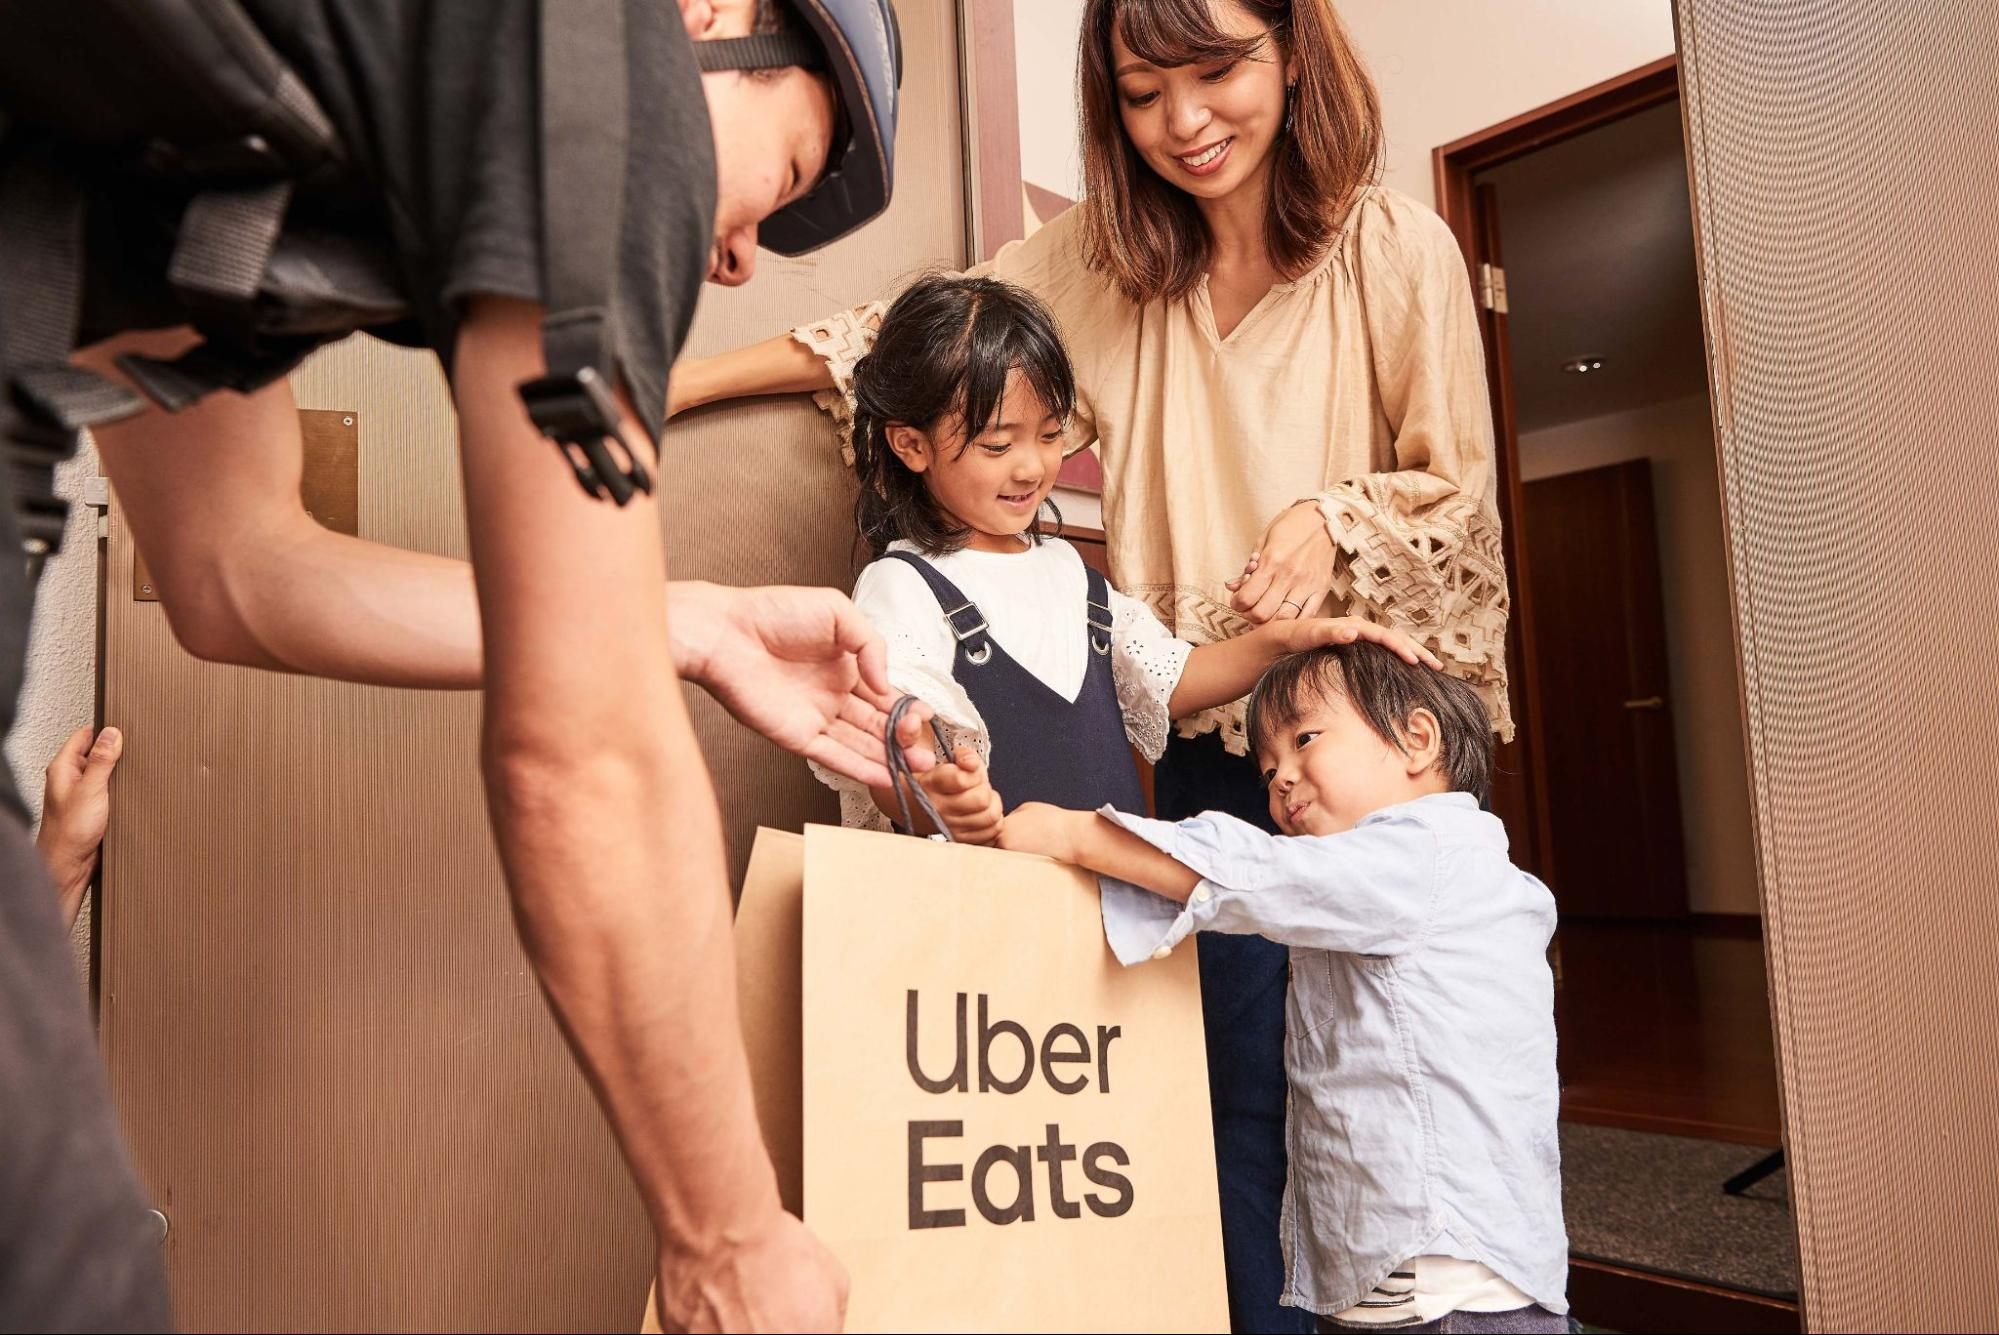 Uber Eats(ウーバーイーツ)のイメージ写真